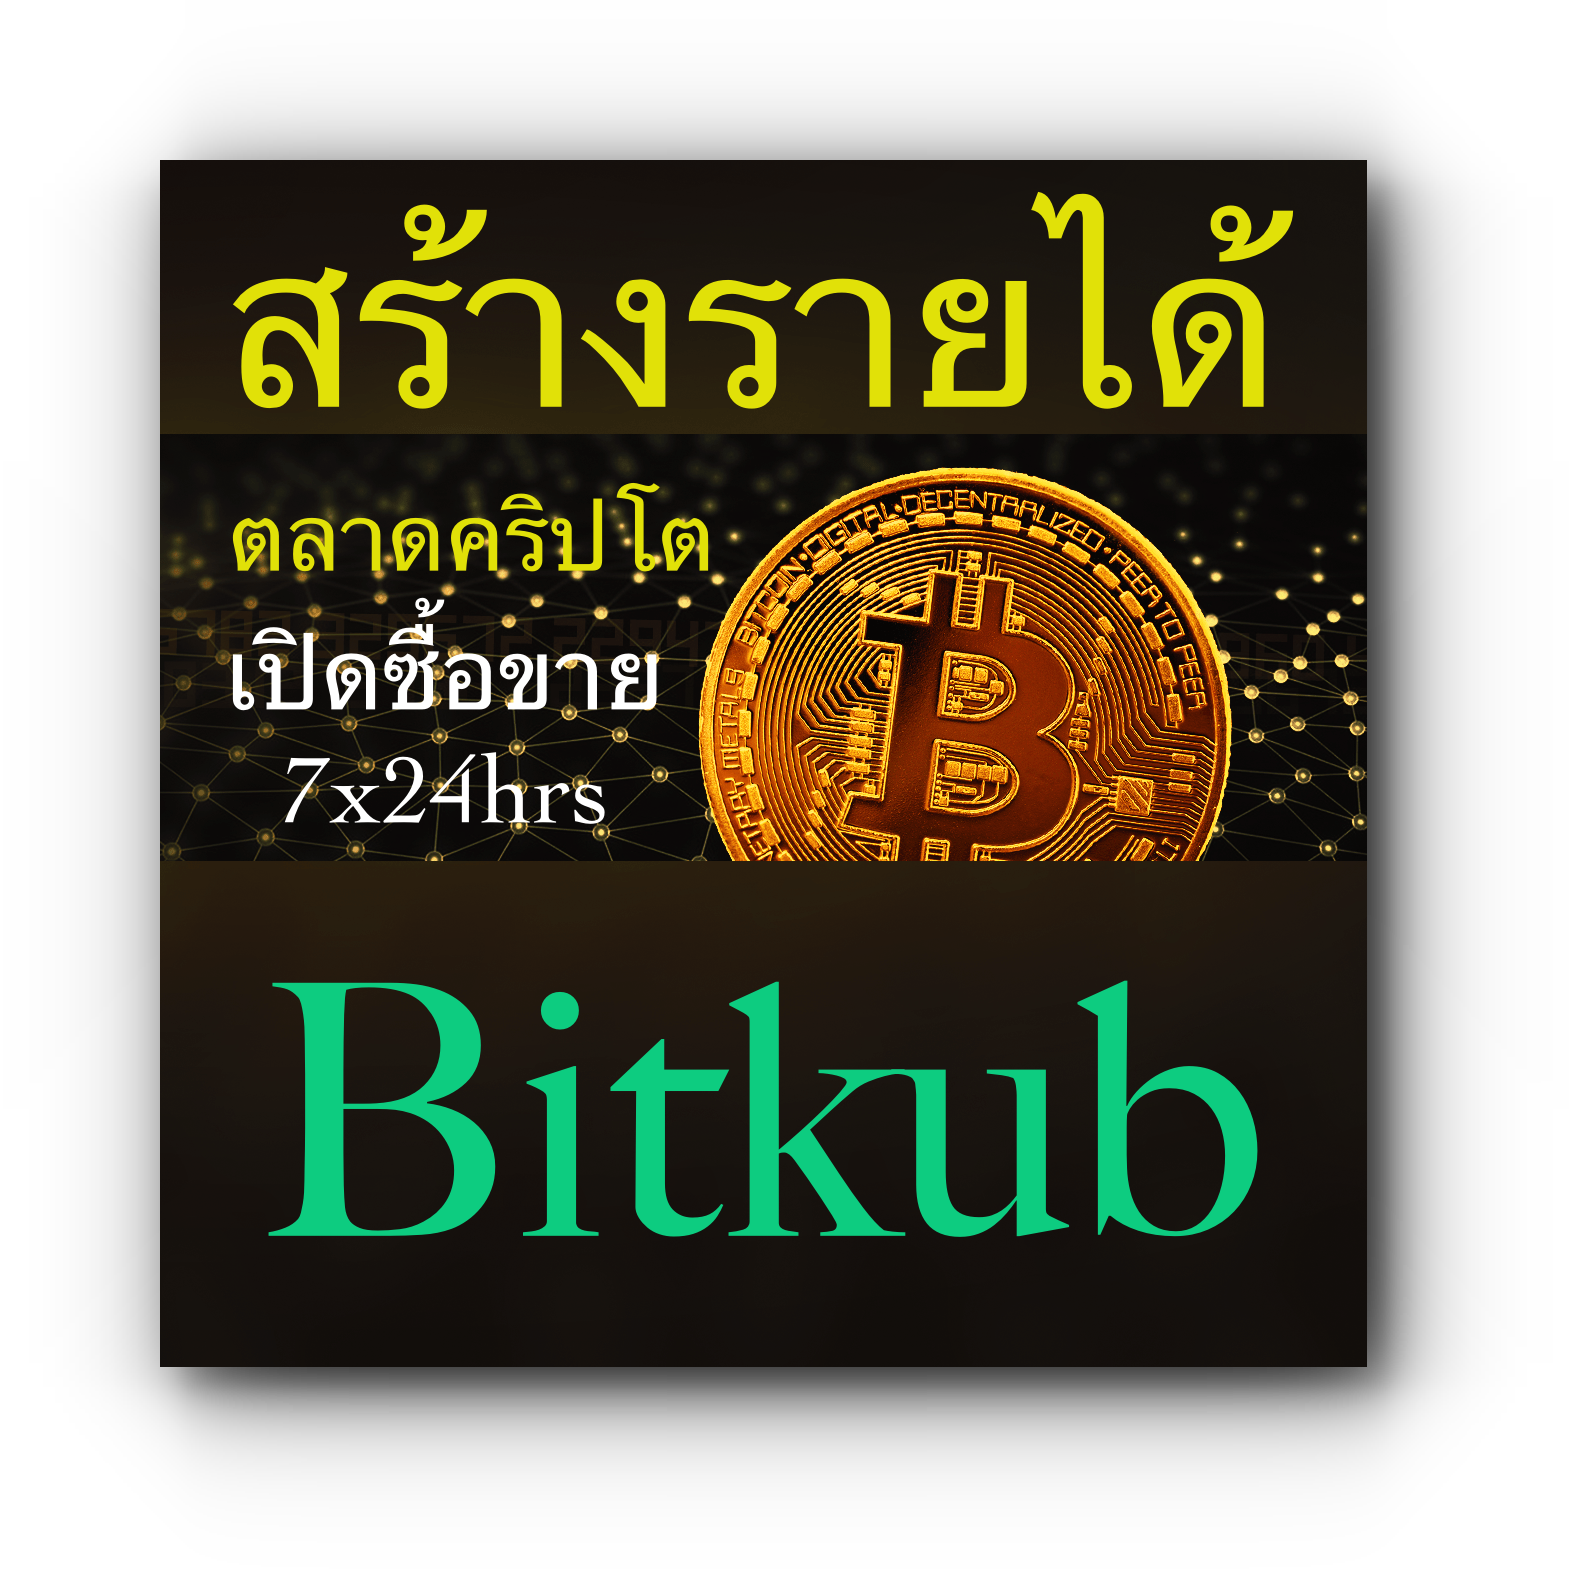 Bitkub Thailand Cryptocurrency Bitcoin Exchange